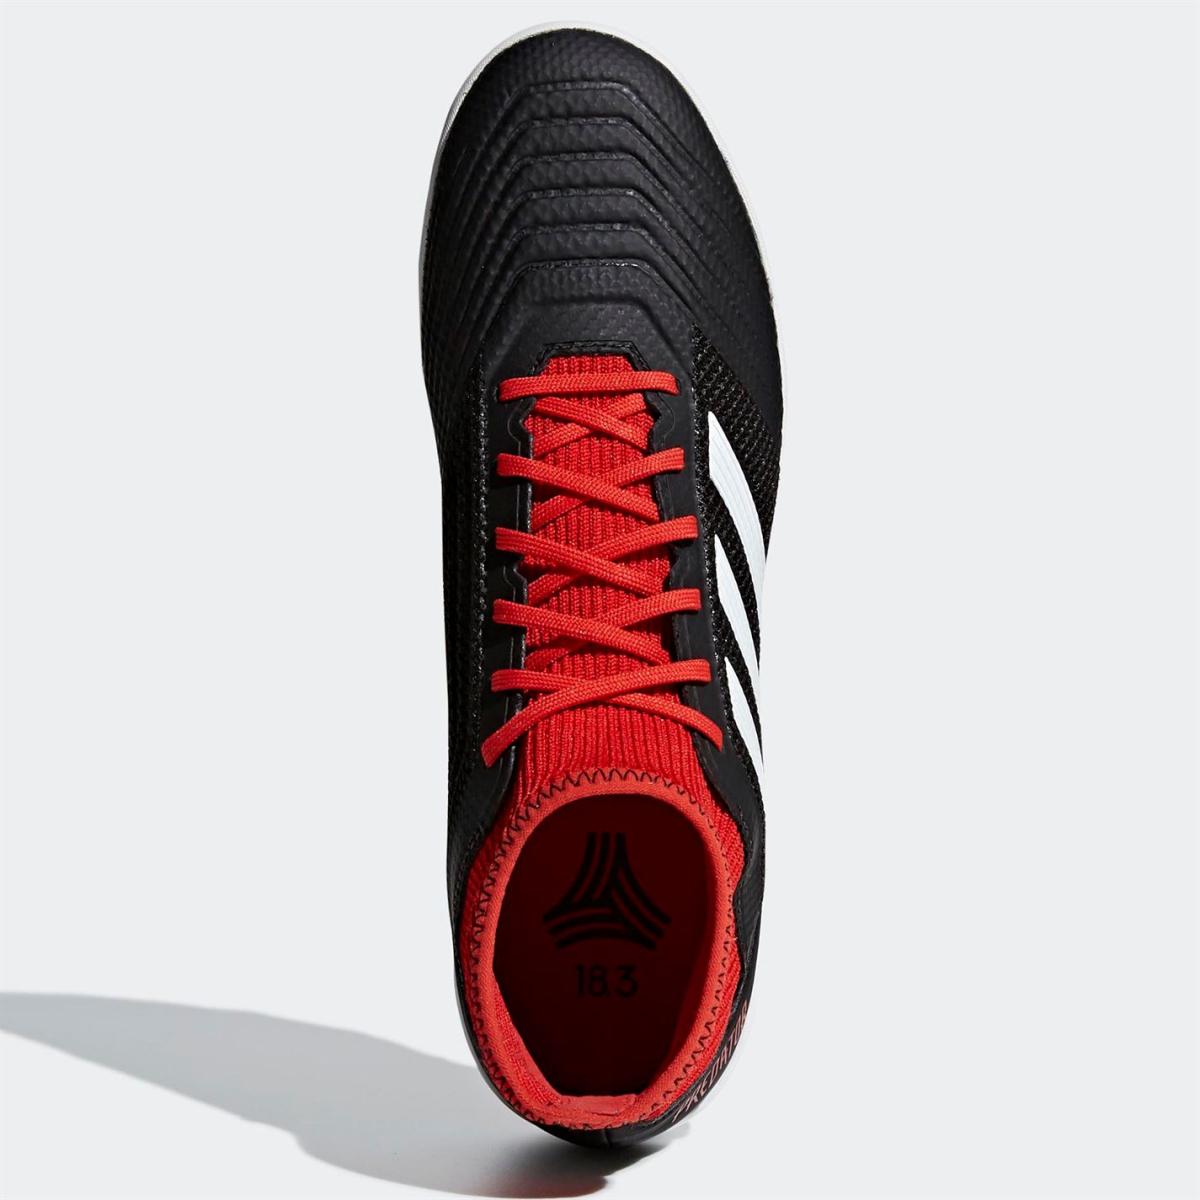 adidas Predator Tango 18.3 Herren AT Astro Turf Kunstrasen Fußballschuhe  Schwarz_Wht_Rot